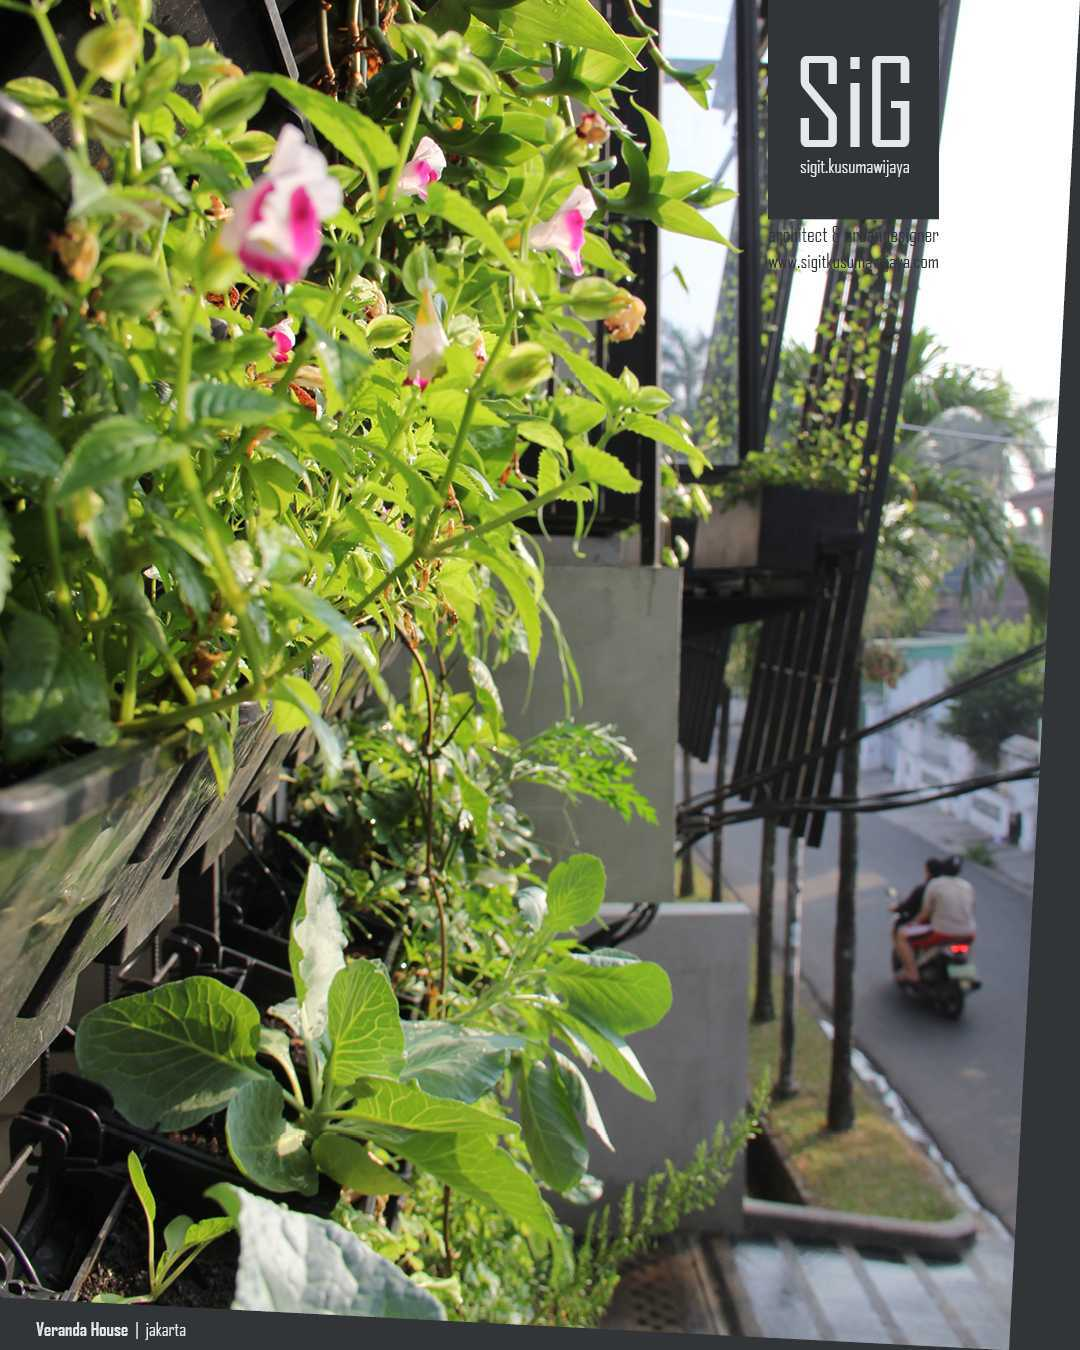 Sigit.kusumawijaya | Architect & Urbandesigner Rumah Beranda - Green Boarding House Cipete, South Jakarta, Indonesia Cipete, South Jakarta, Indonesia Sigitkusumawijaya-Architect-Urbandesigner-Rumah-Beranda-Green-Boarding-House Tropis 55009